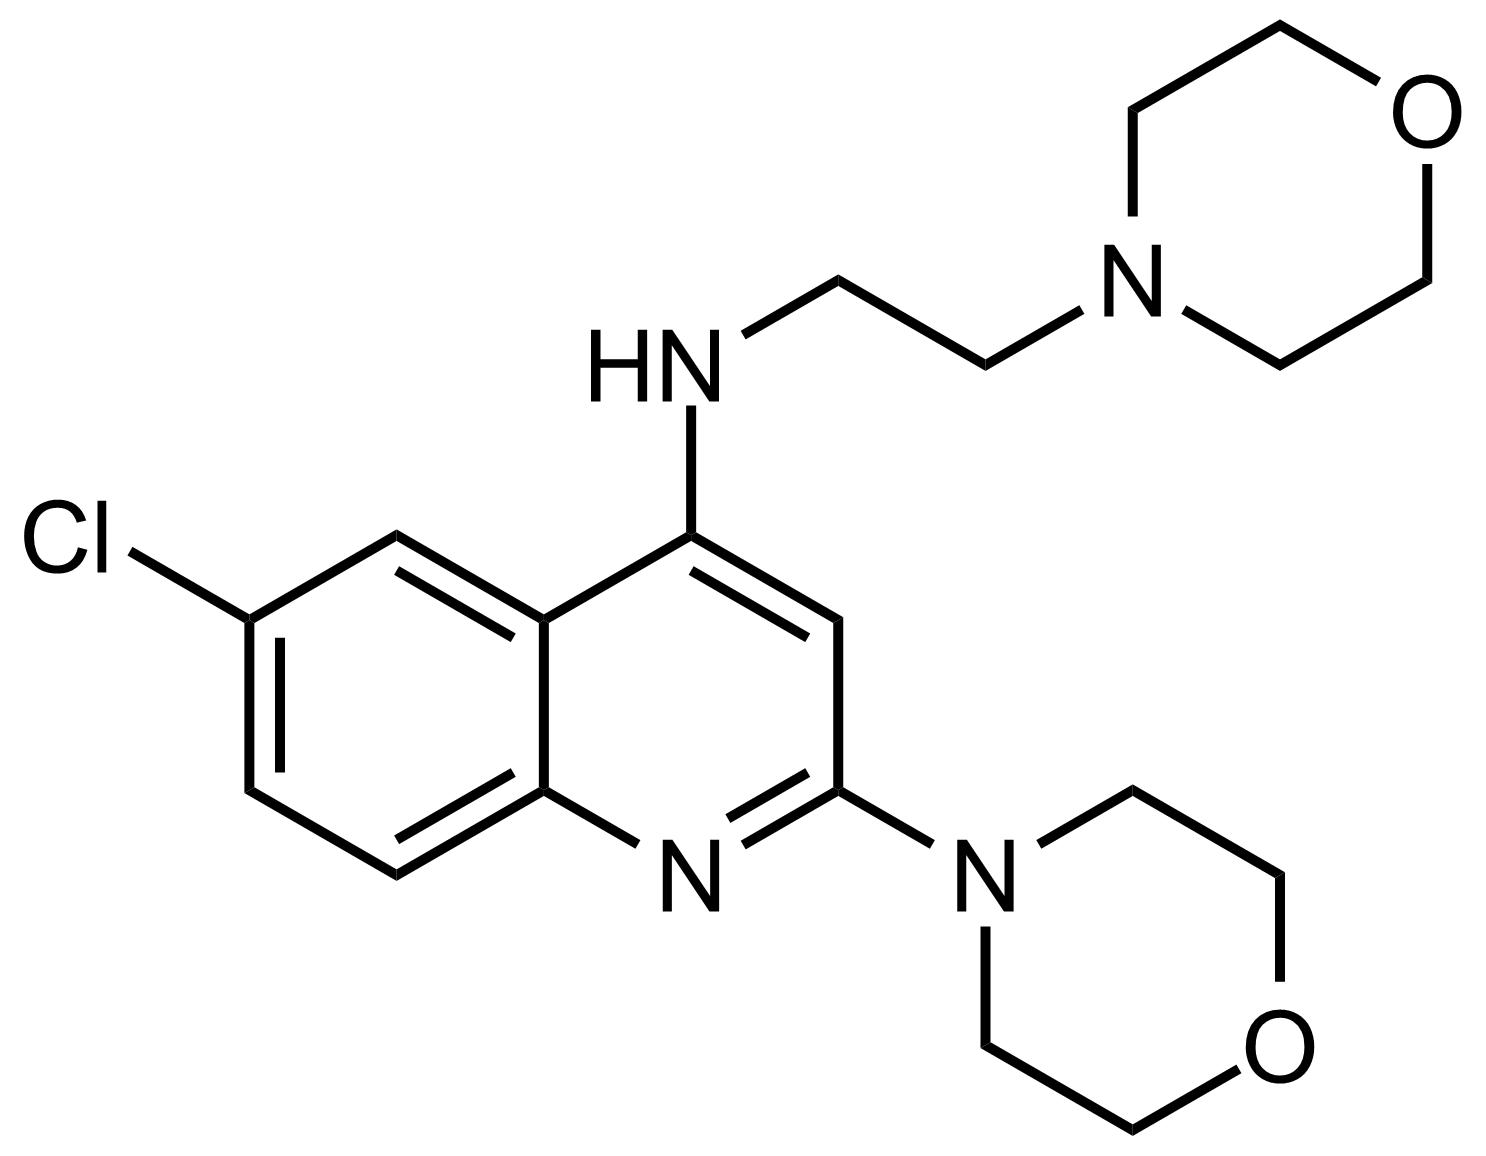 Structure of 6-Chloro-2-morpholino-N-(2-morpholinoethyl)quinolin-4-amine